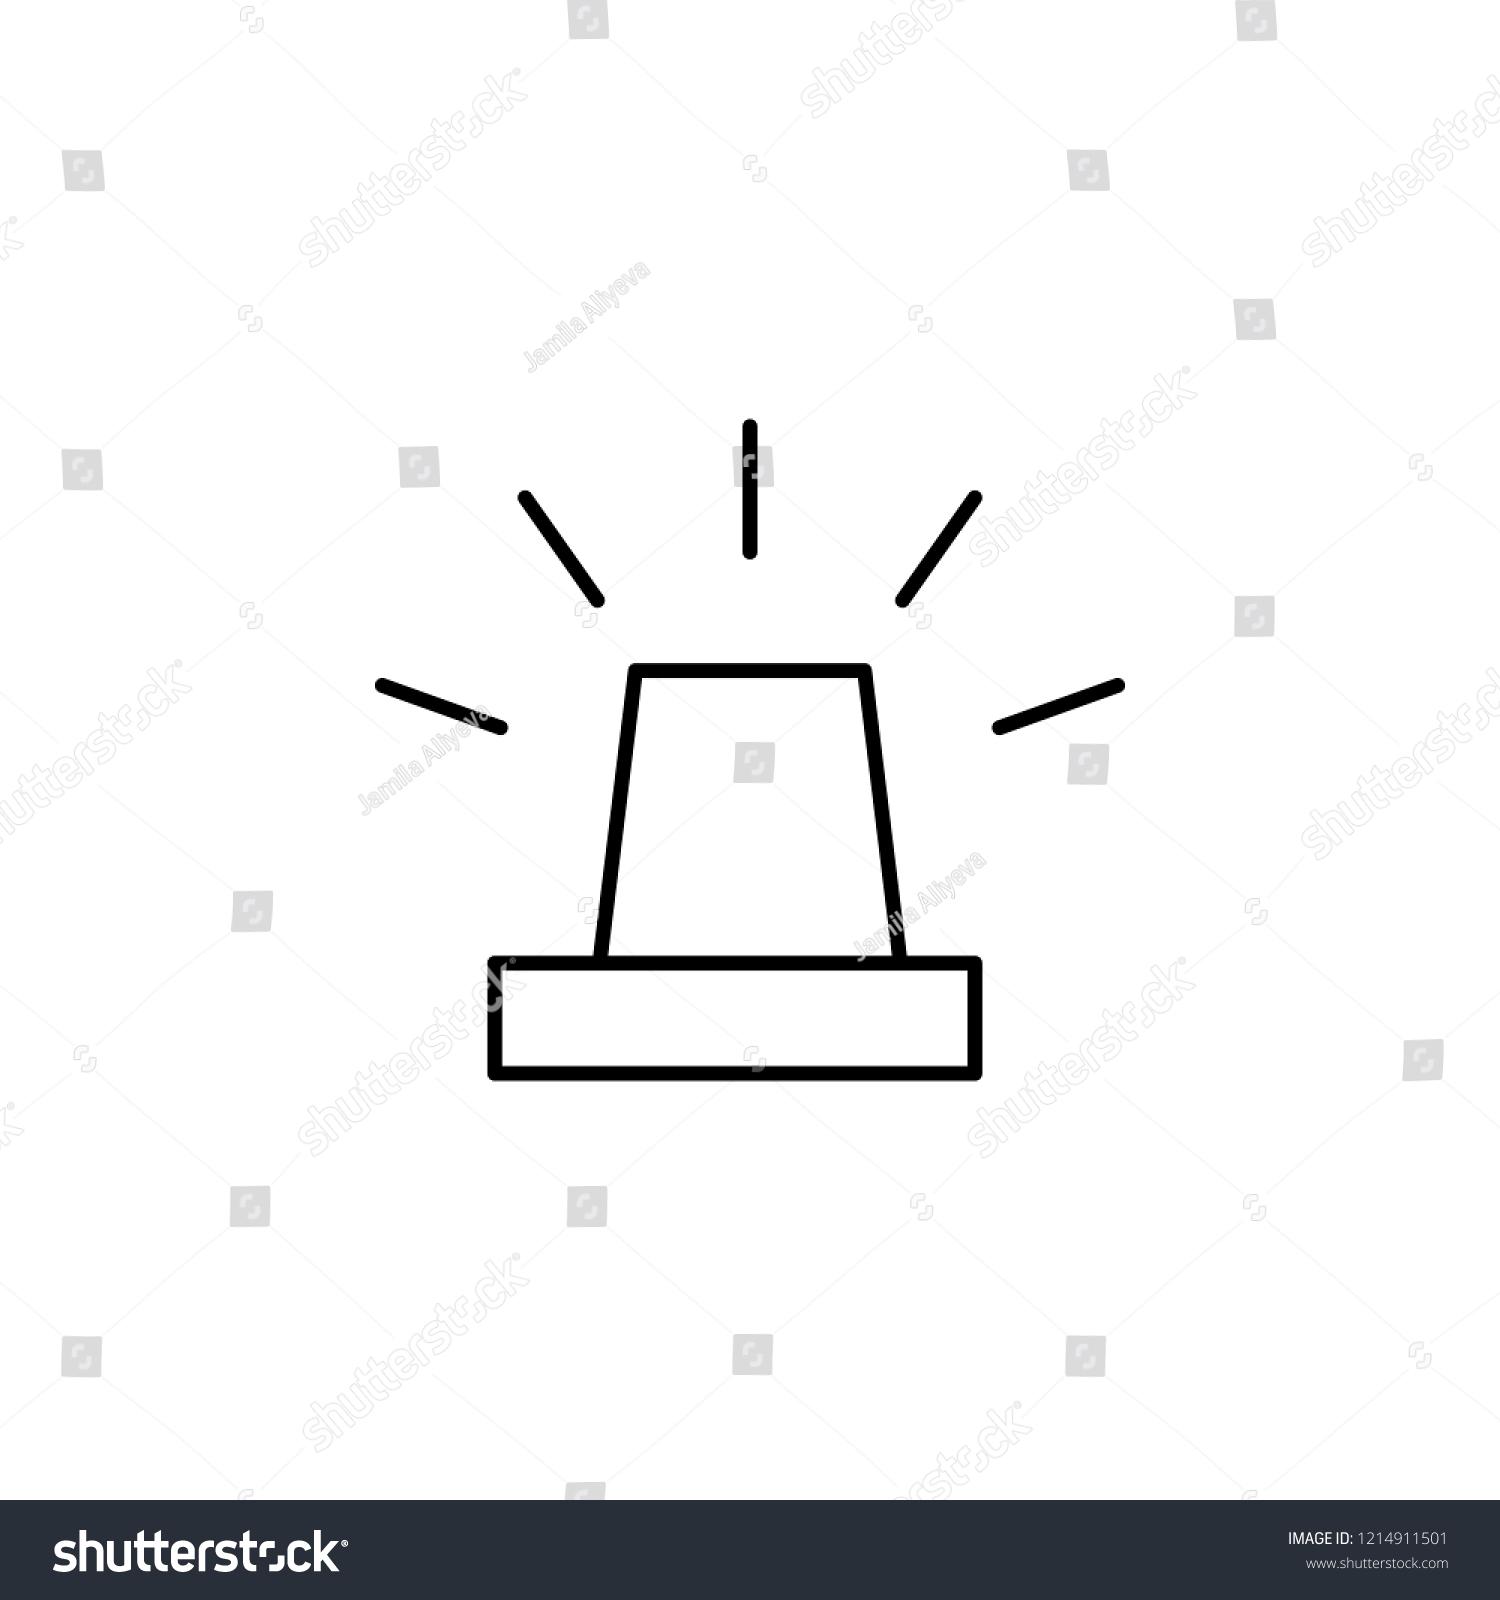 hight resolution of alarm icon element of simple web icon thin line icon for website design and development app development premium icon illustration